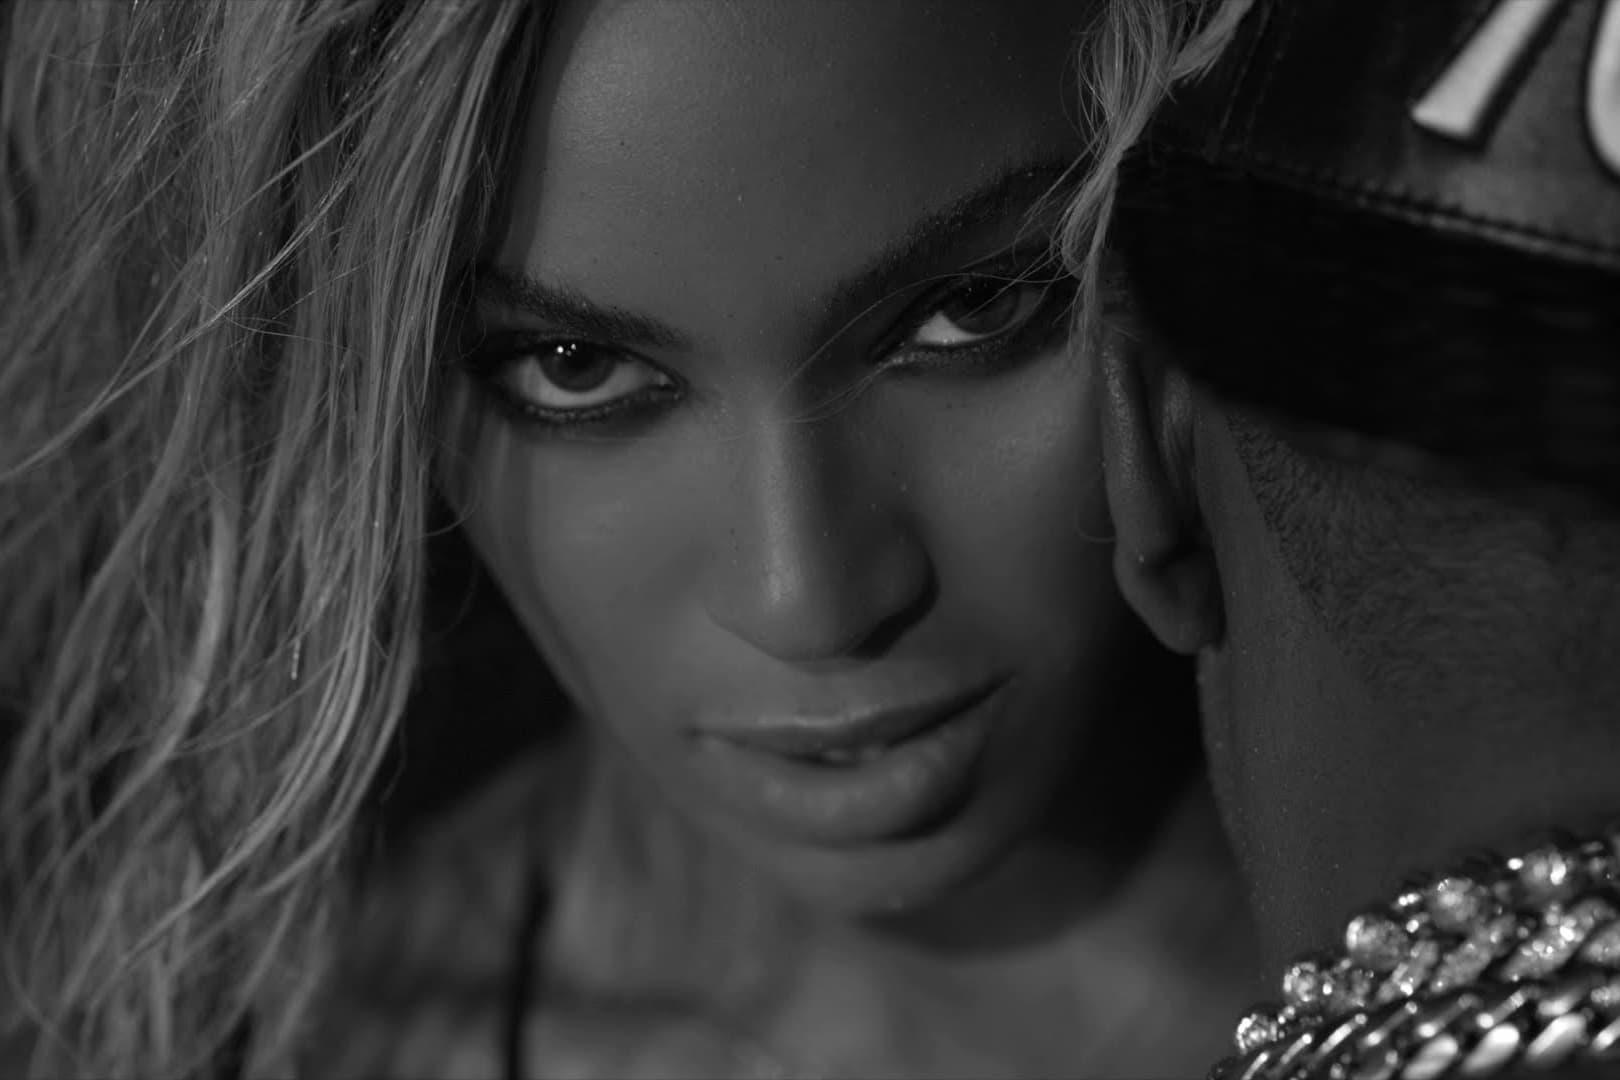 Coachella Lineup Released: Kendrick, Beyoncé and Radiohead Set to Headline